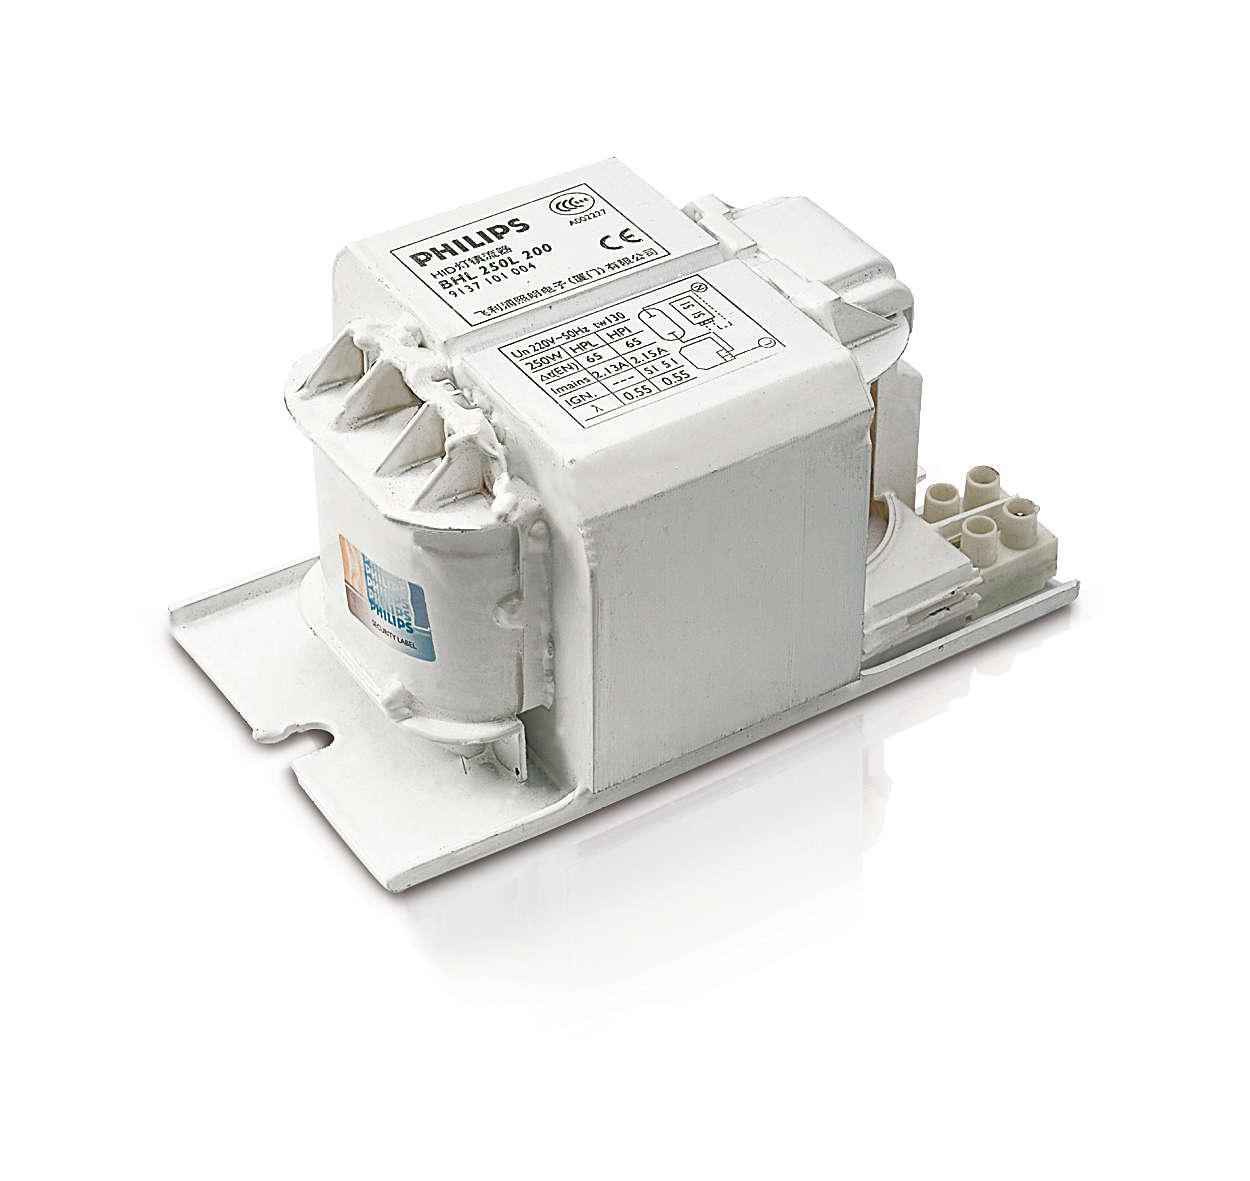 HID-Basic Semi-Parallel ballasts for MHN/CDM lamps